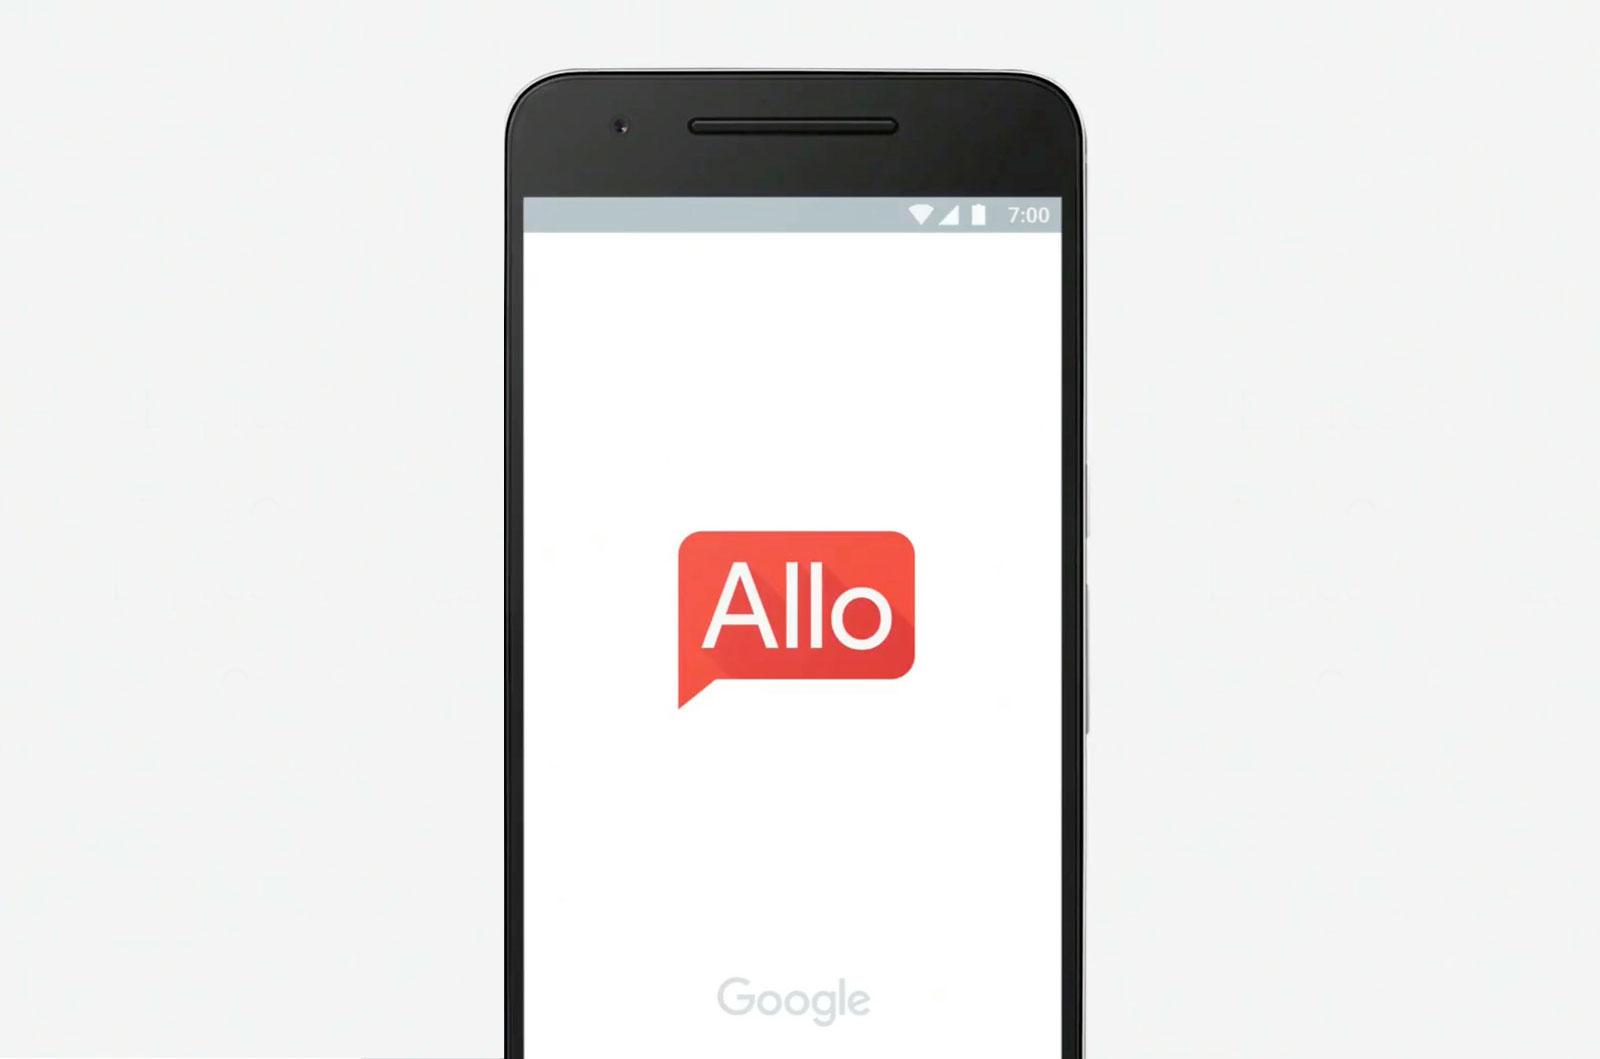 Edward Snowden er ikke videre begeistret over at Allo ikke har superkryptering som standard.